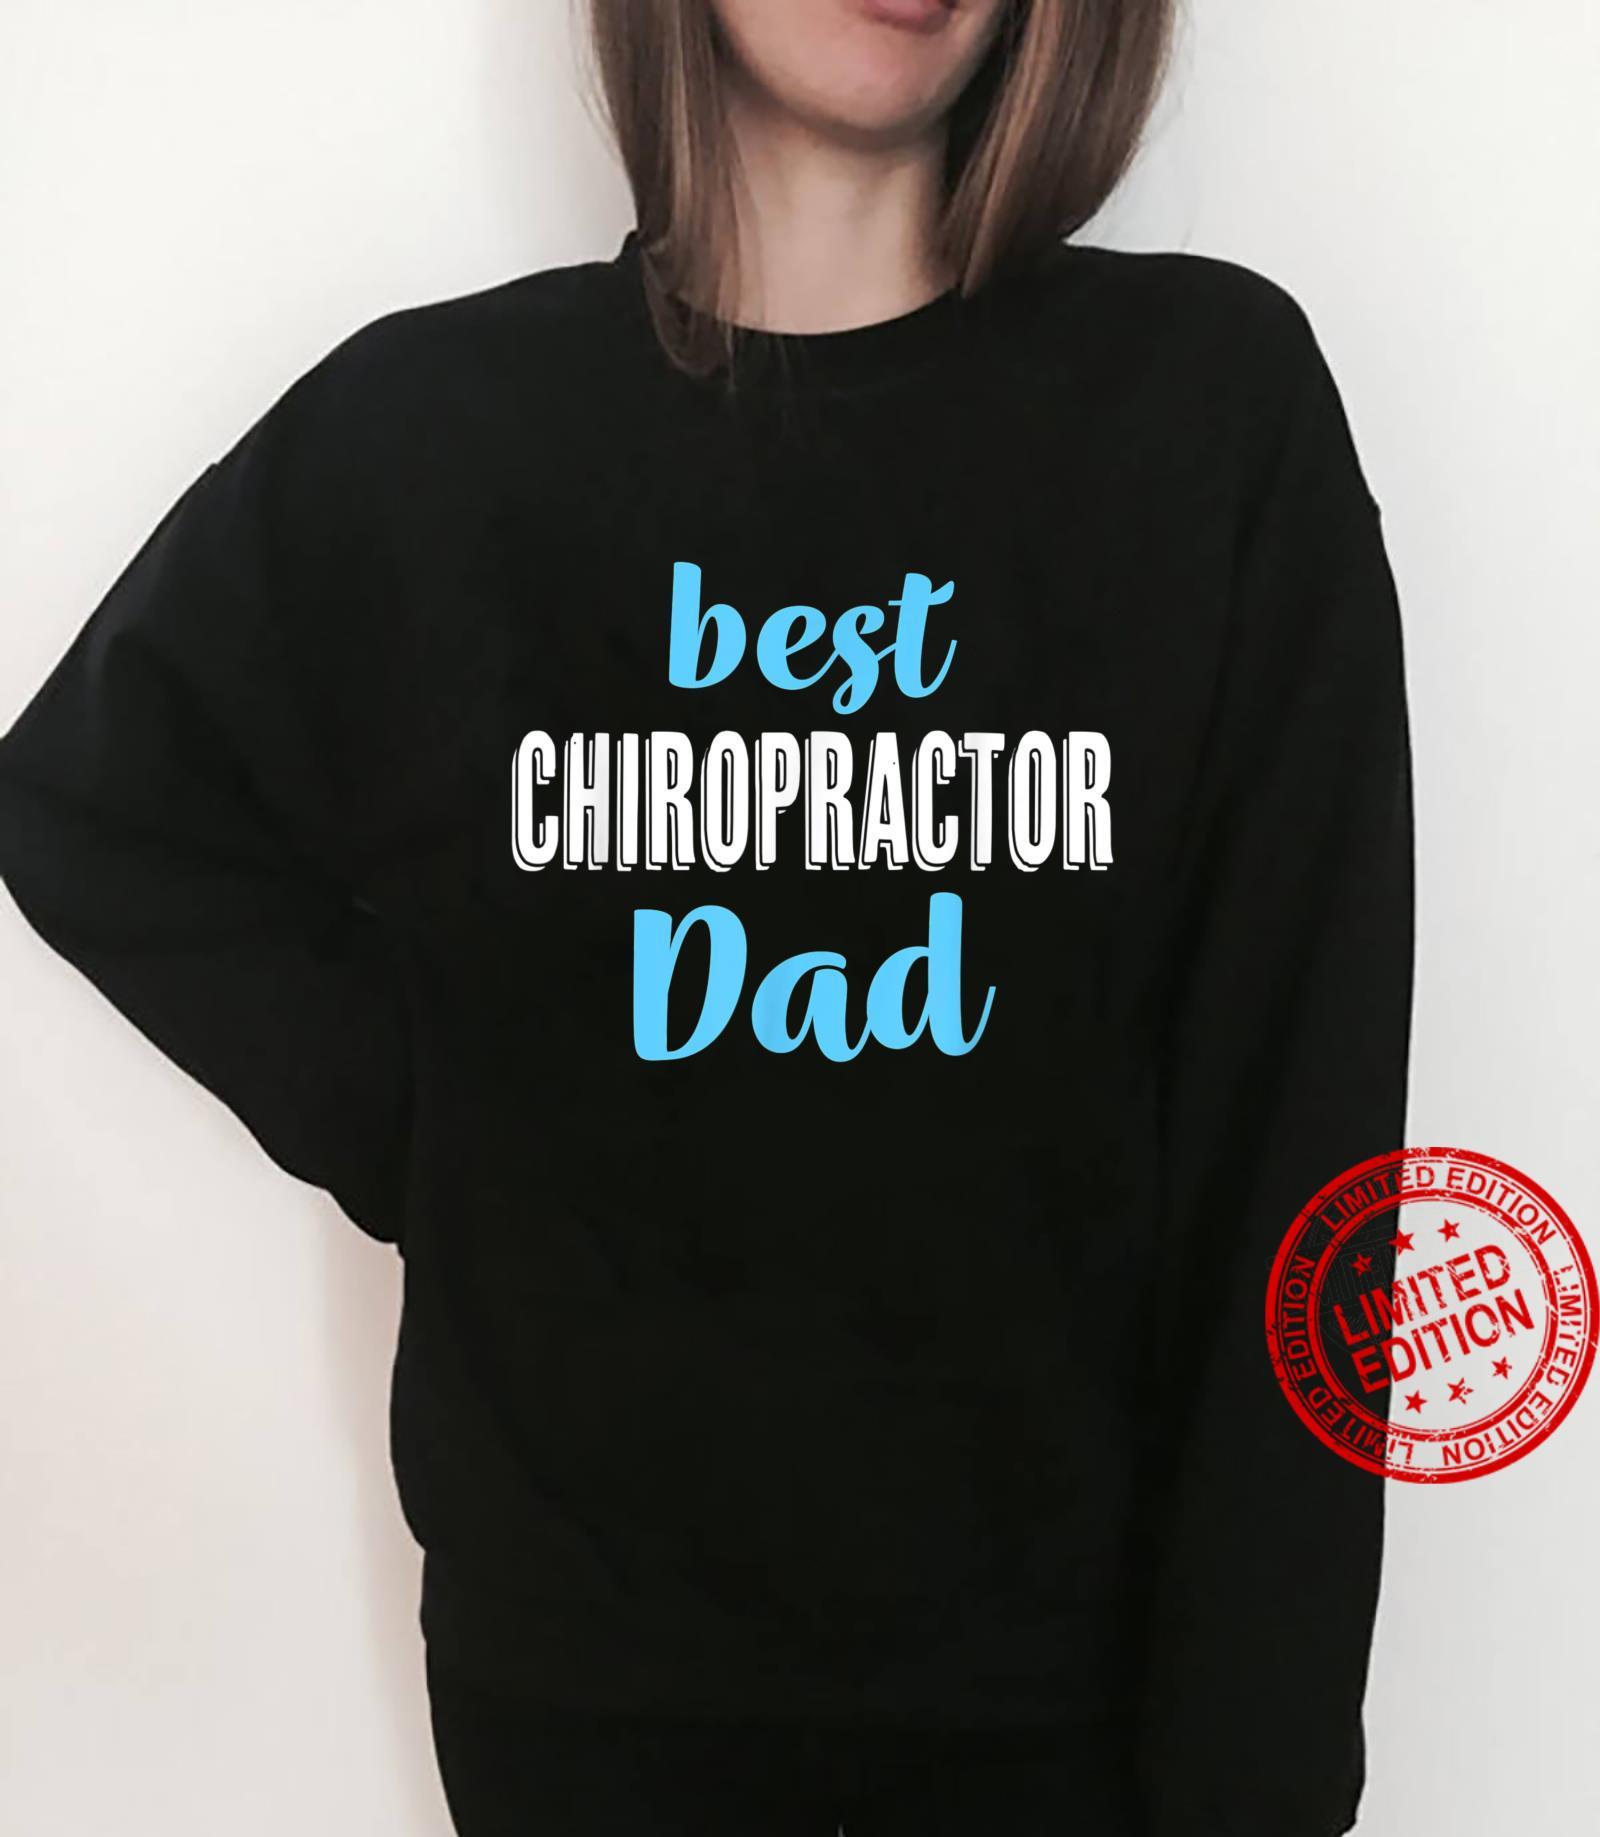 Best Chiropractor Dad From Daughter Son Shirt sweater